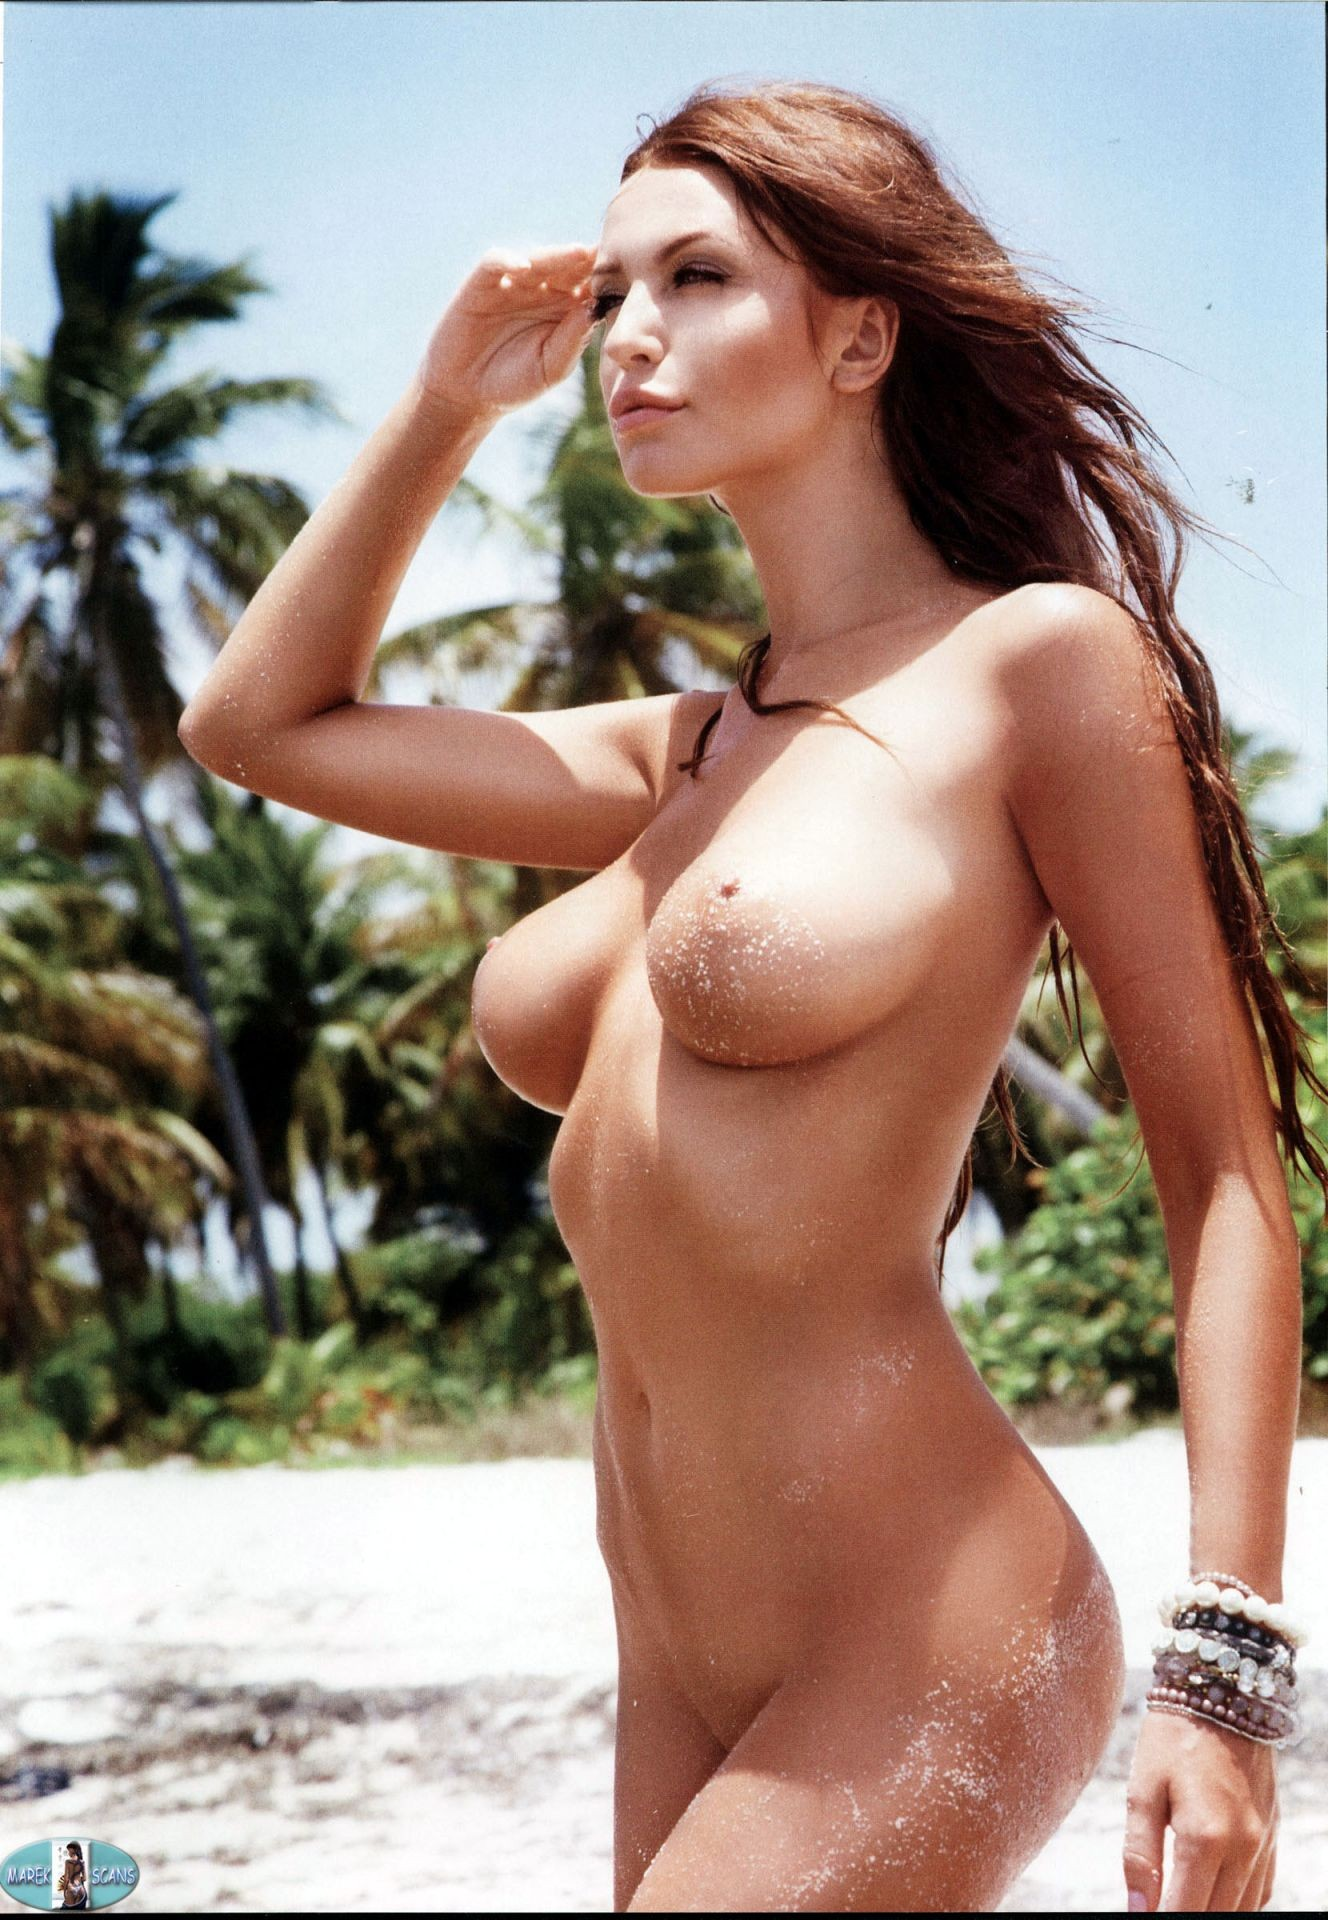 Nude beach ukraine sex on the beach perverts masturbate - 1 part 4